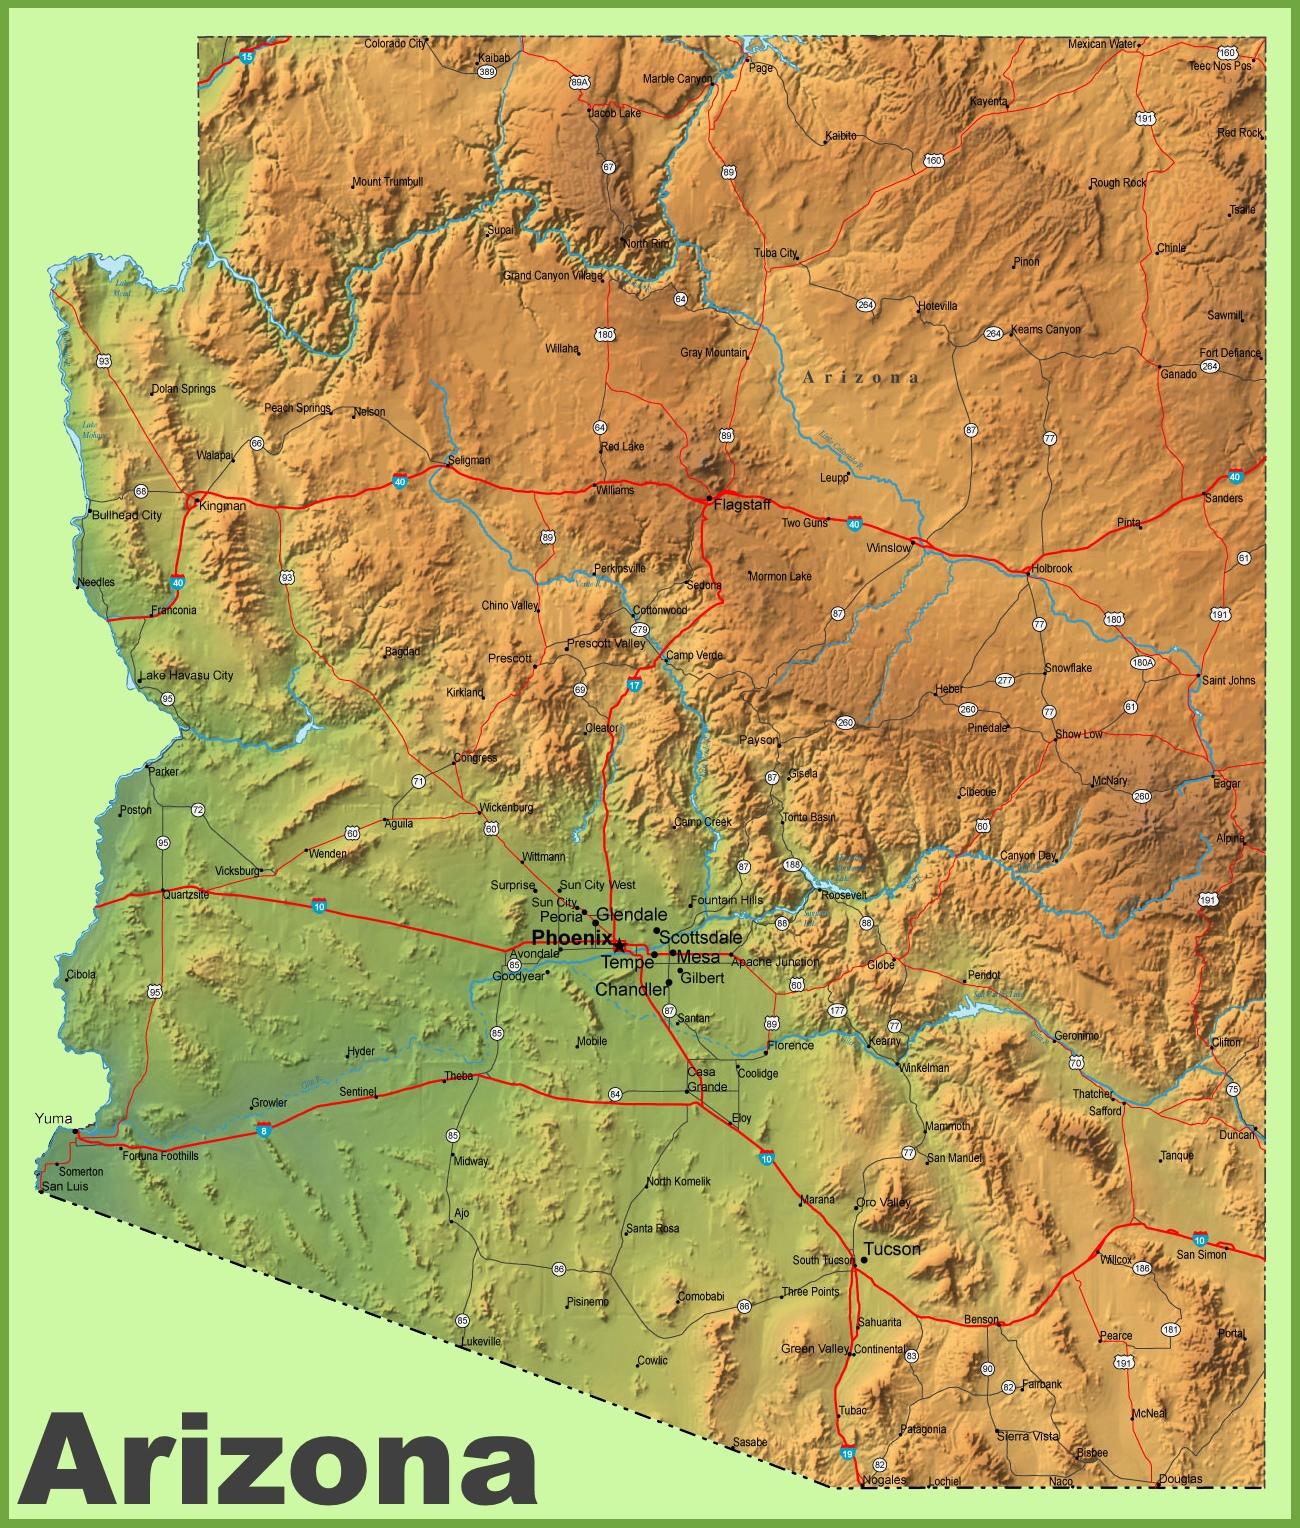 Physical Map Of Arizona Arizona physical map